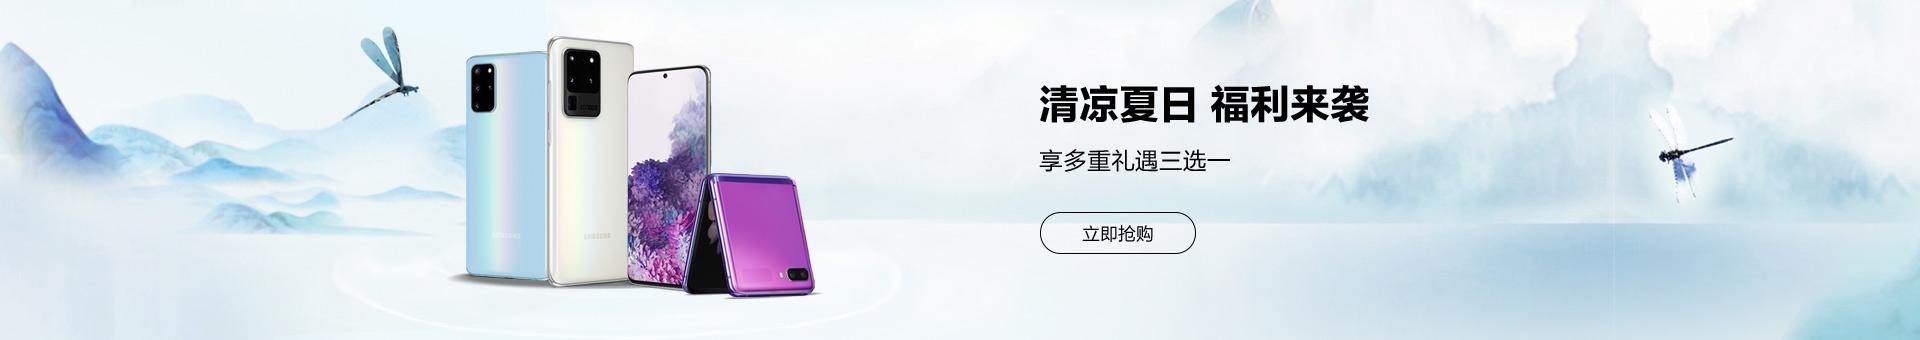 Galaxy S20系列换新补贴